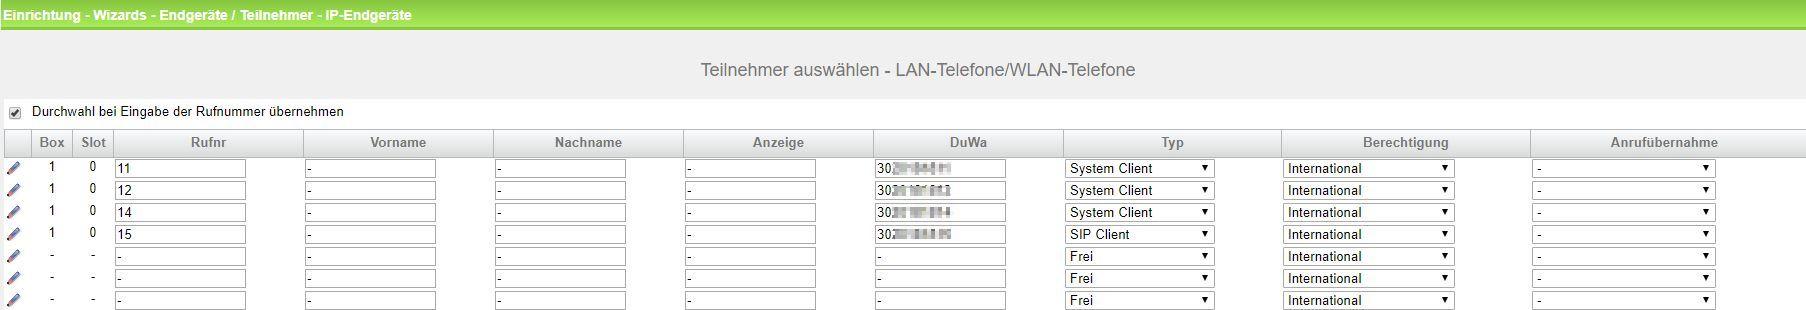 konfigurationshilfen:unify:unify-openscape-business-v2-reventix.de-16.jpg